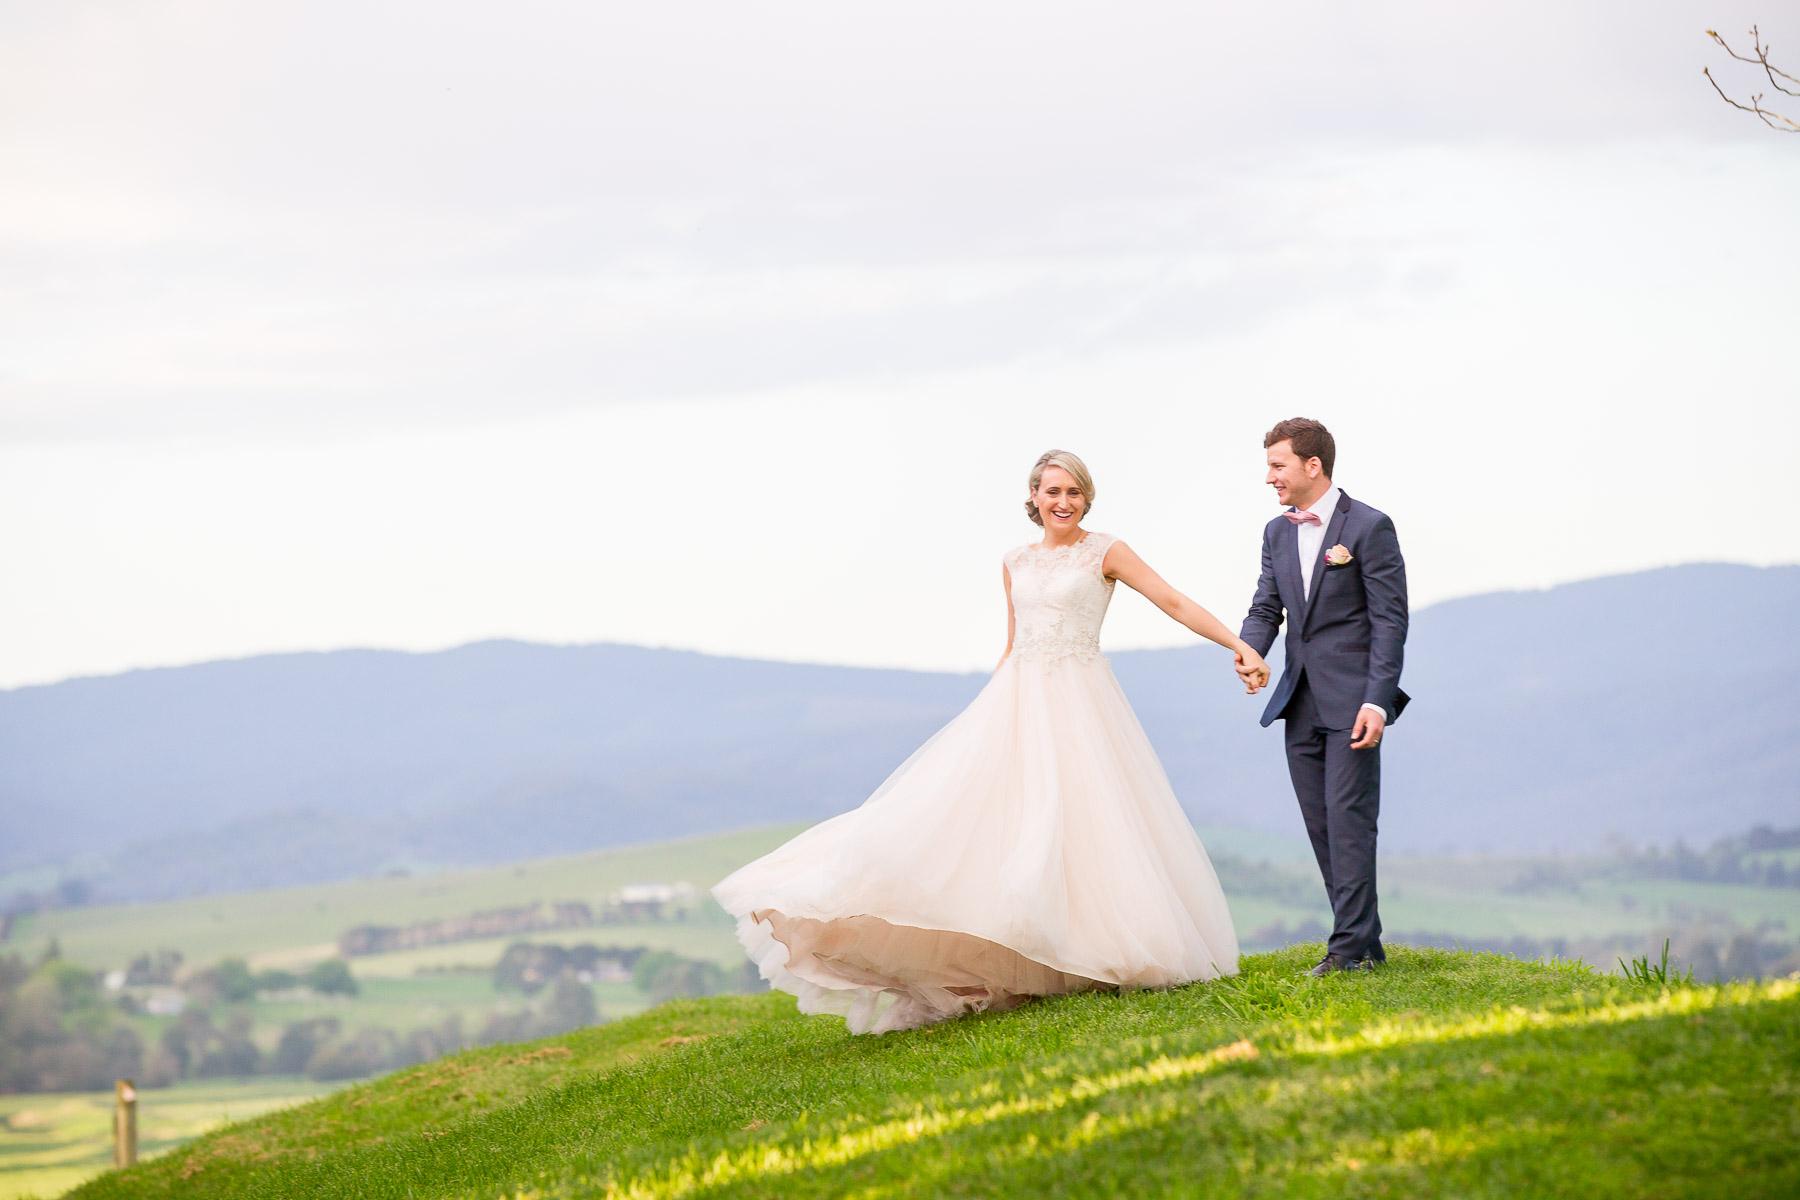 Marnie_and_Charlie_Yarra_Valley_Wedding_Blog-71.jpg